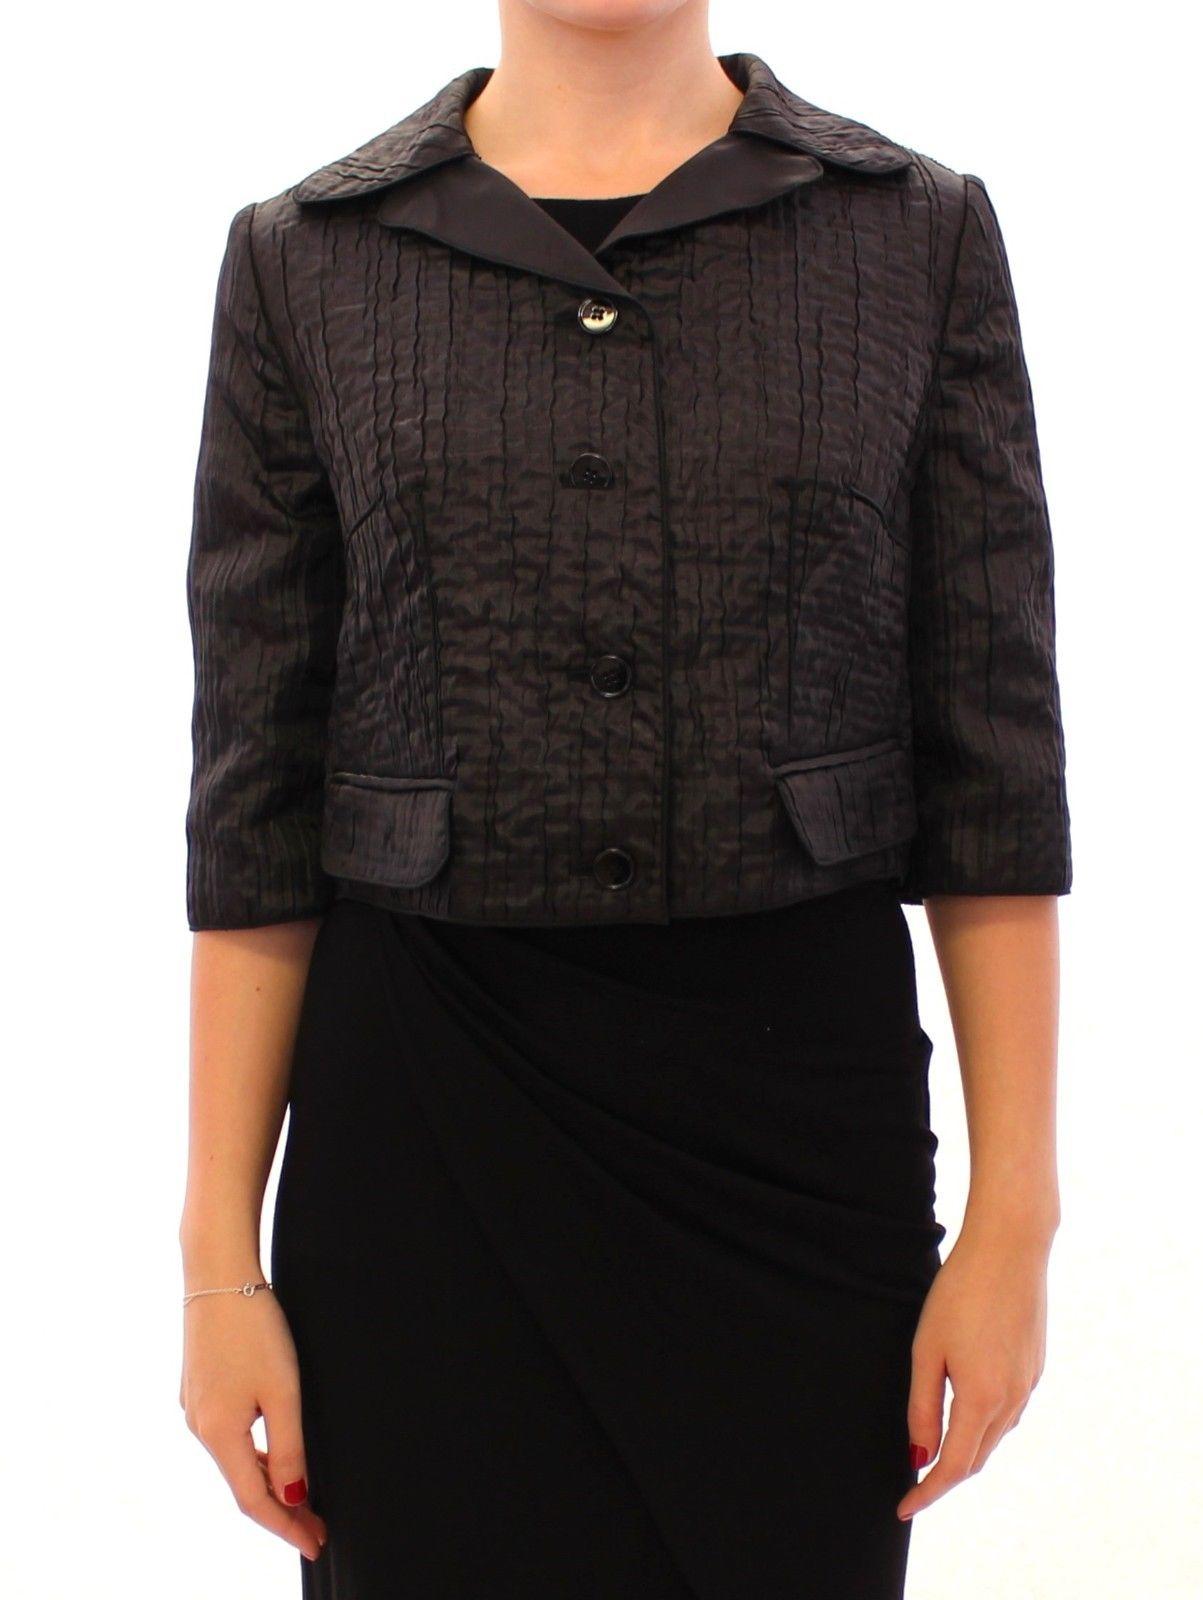 Dolce & Gabbana Women's Short Bolero Shrug Jacket Black GSS11369 - IT40|S